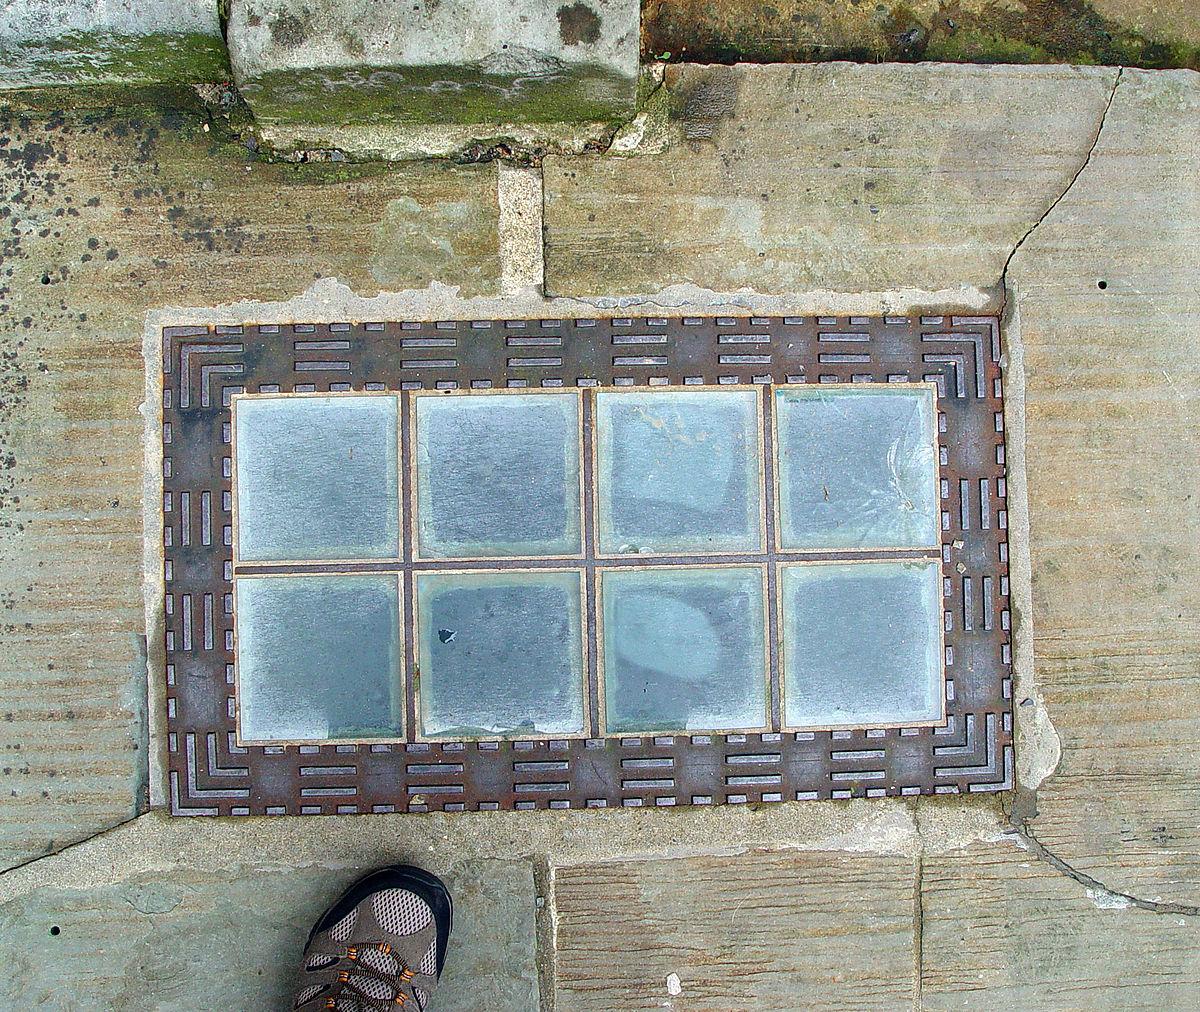 L Shaped Concrete Blocks